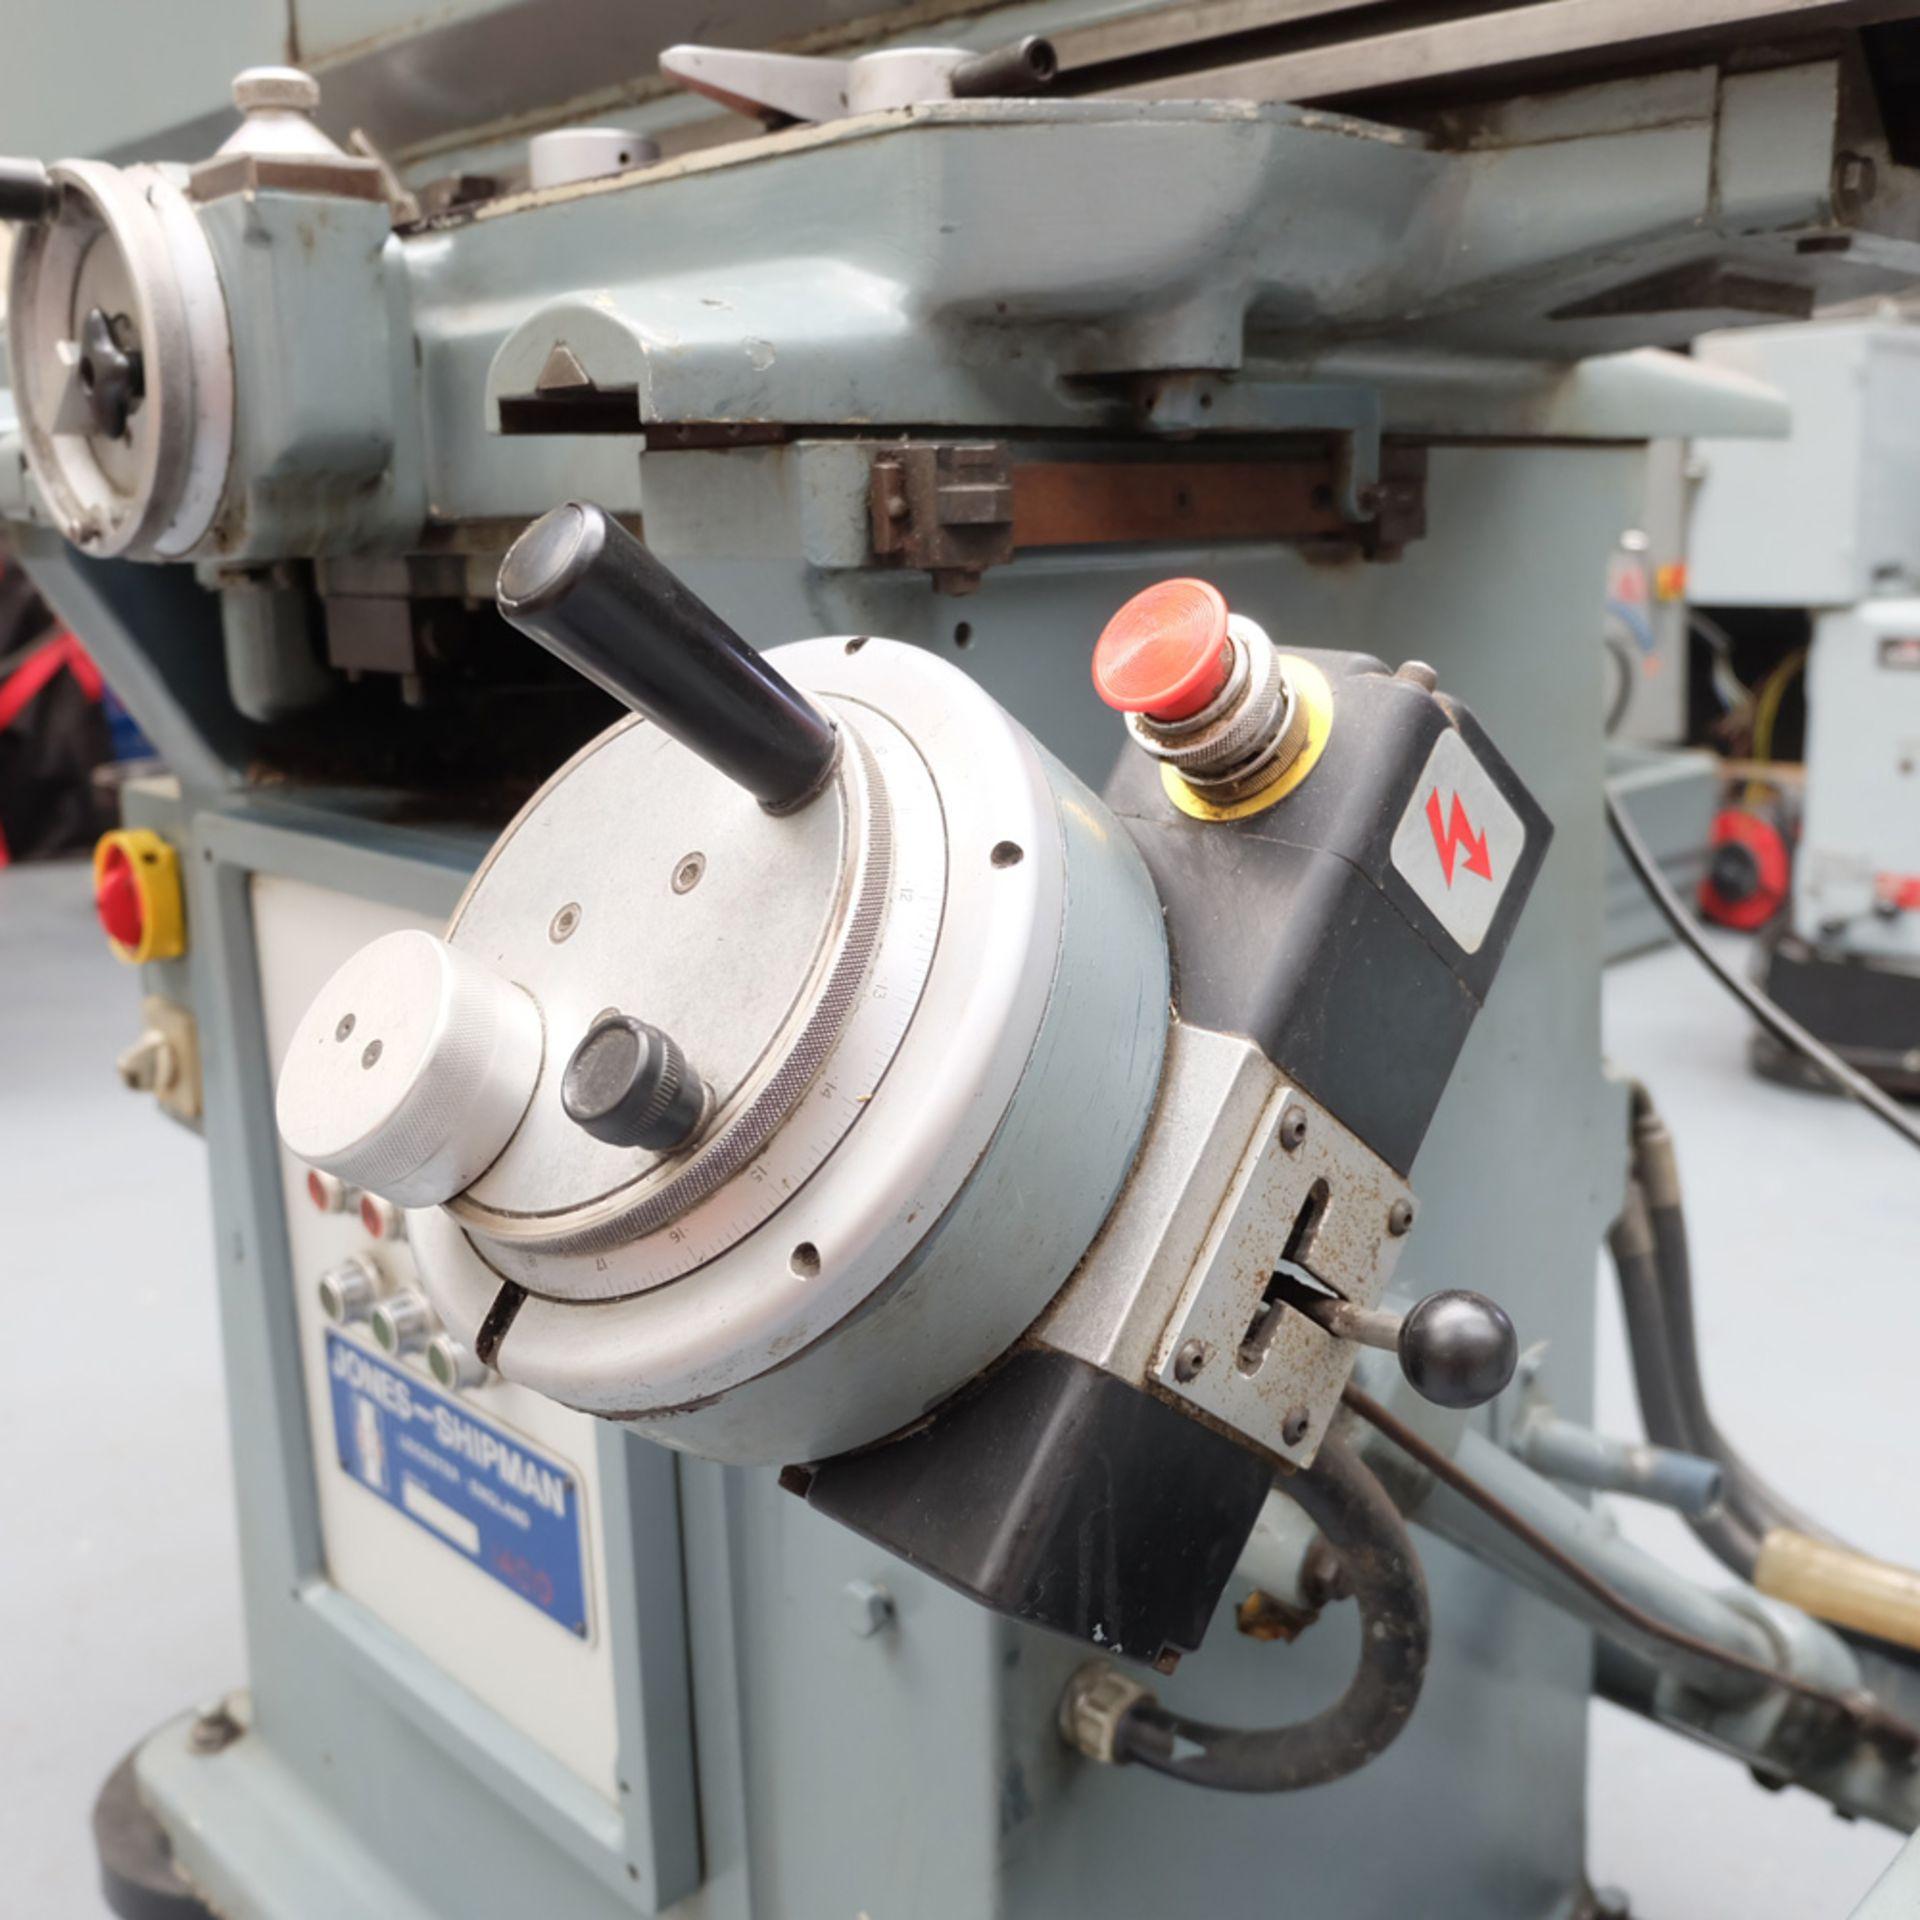 Jones & Shipman 1400P Toolroom Surface Grinder. - Image 3 of 10